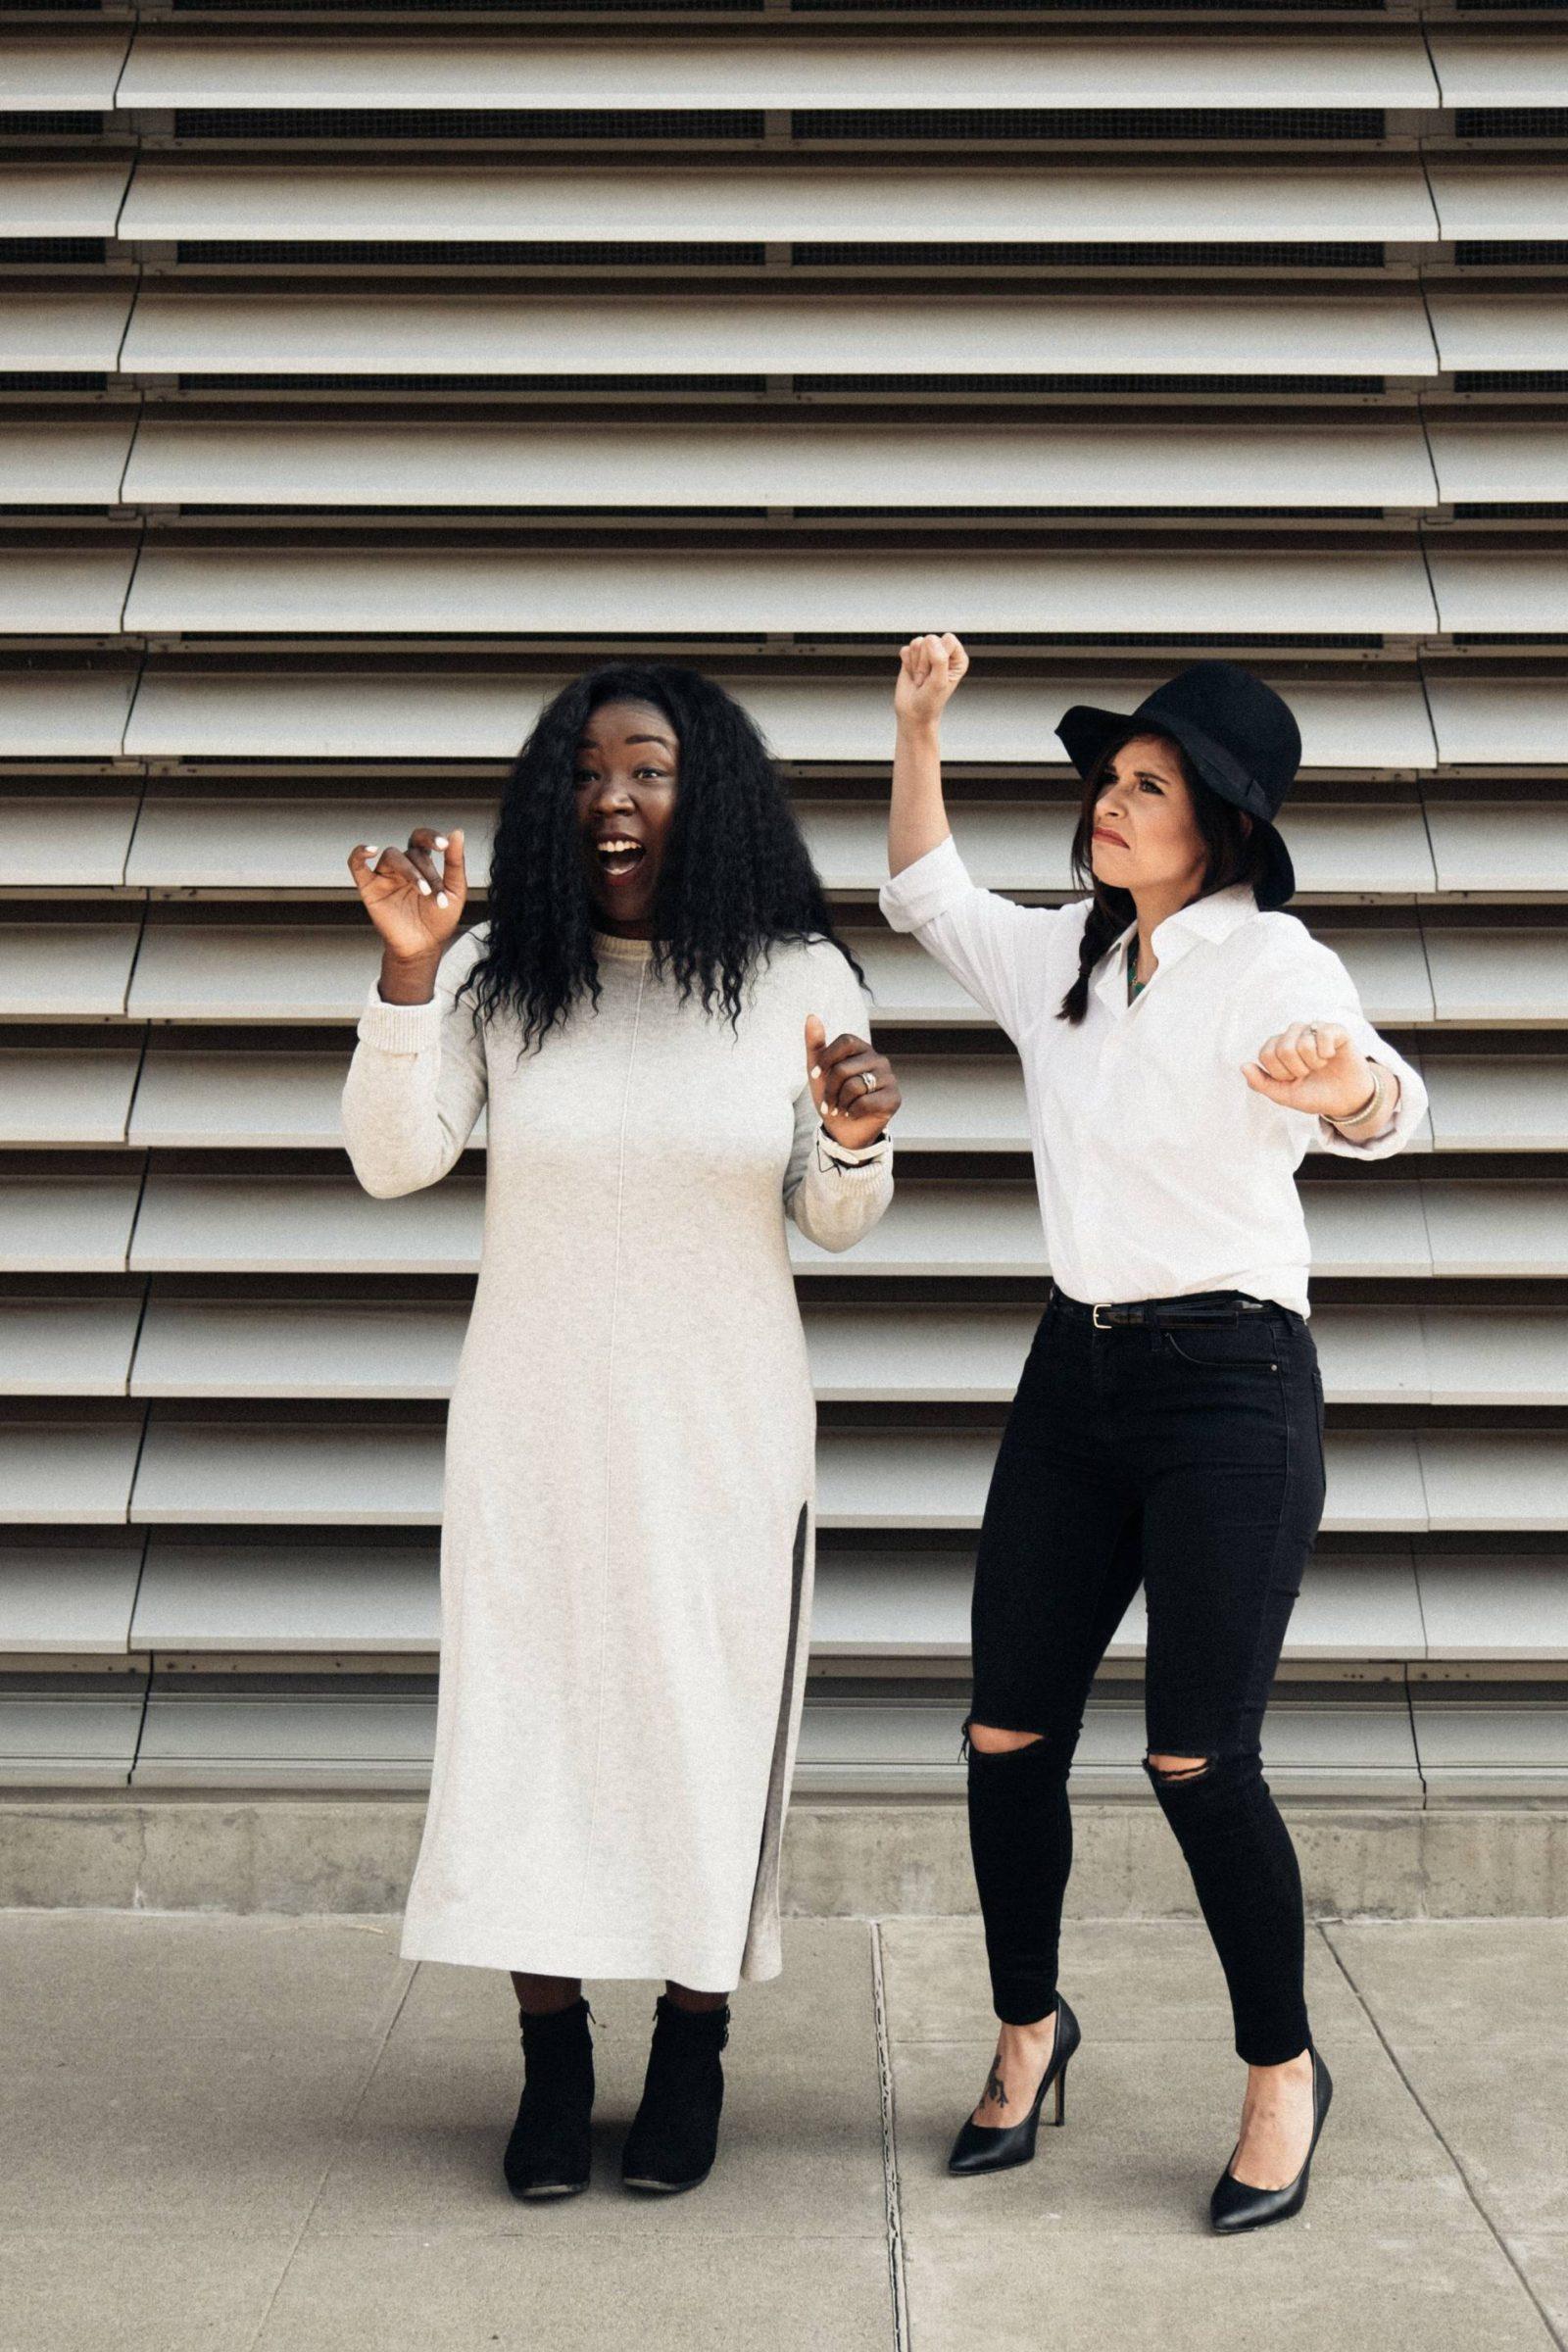 WOMEN EMPOWERING WOMEN SERIES  Featuring Libier Reynolds